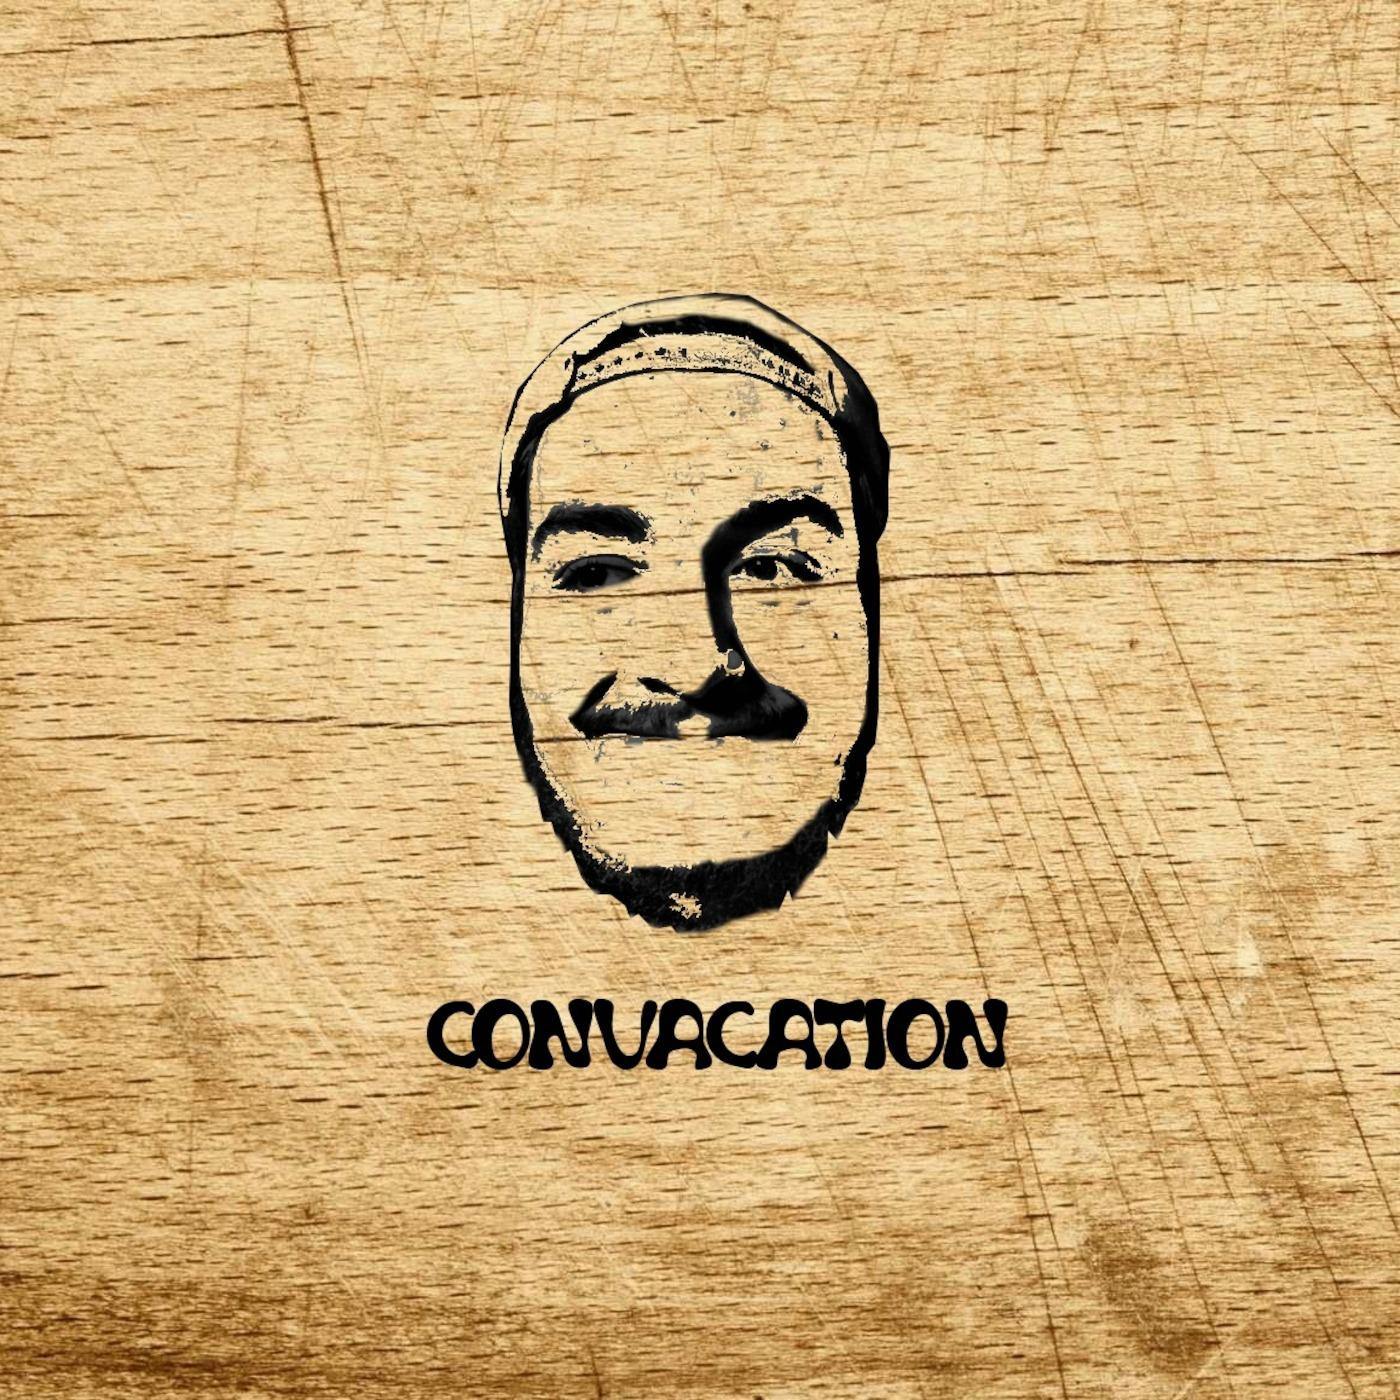 ConVacation